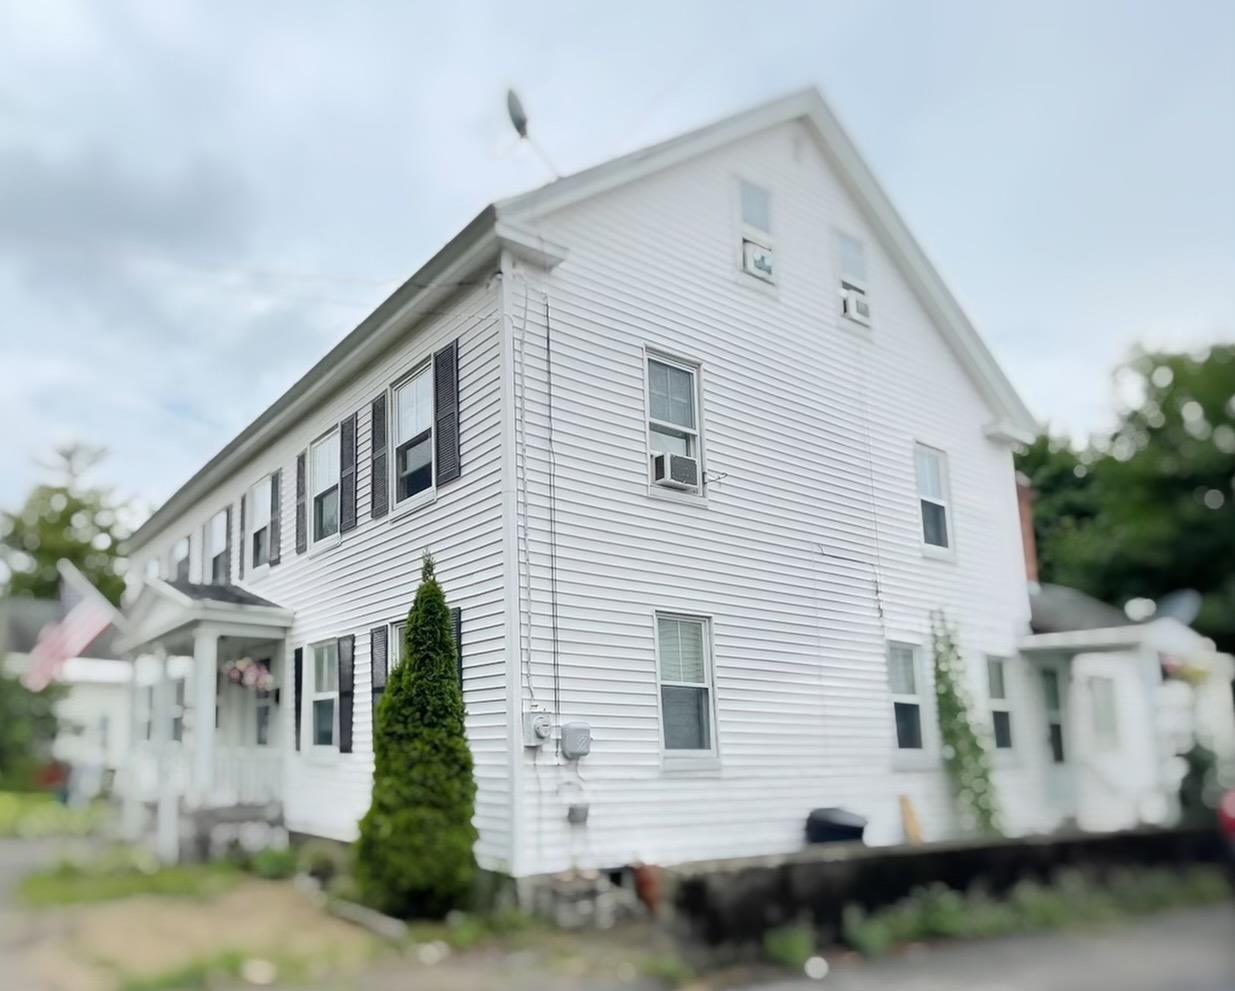 51 Merrimack Street, Concord, NH 03303